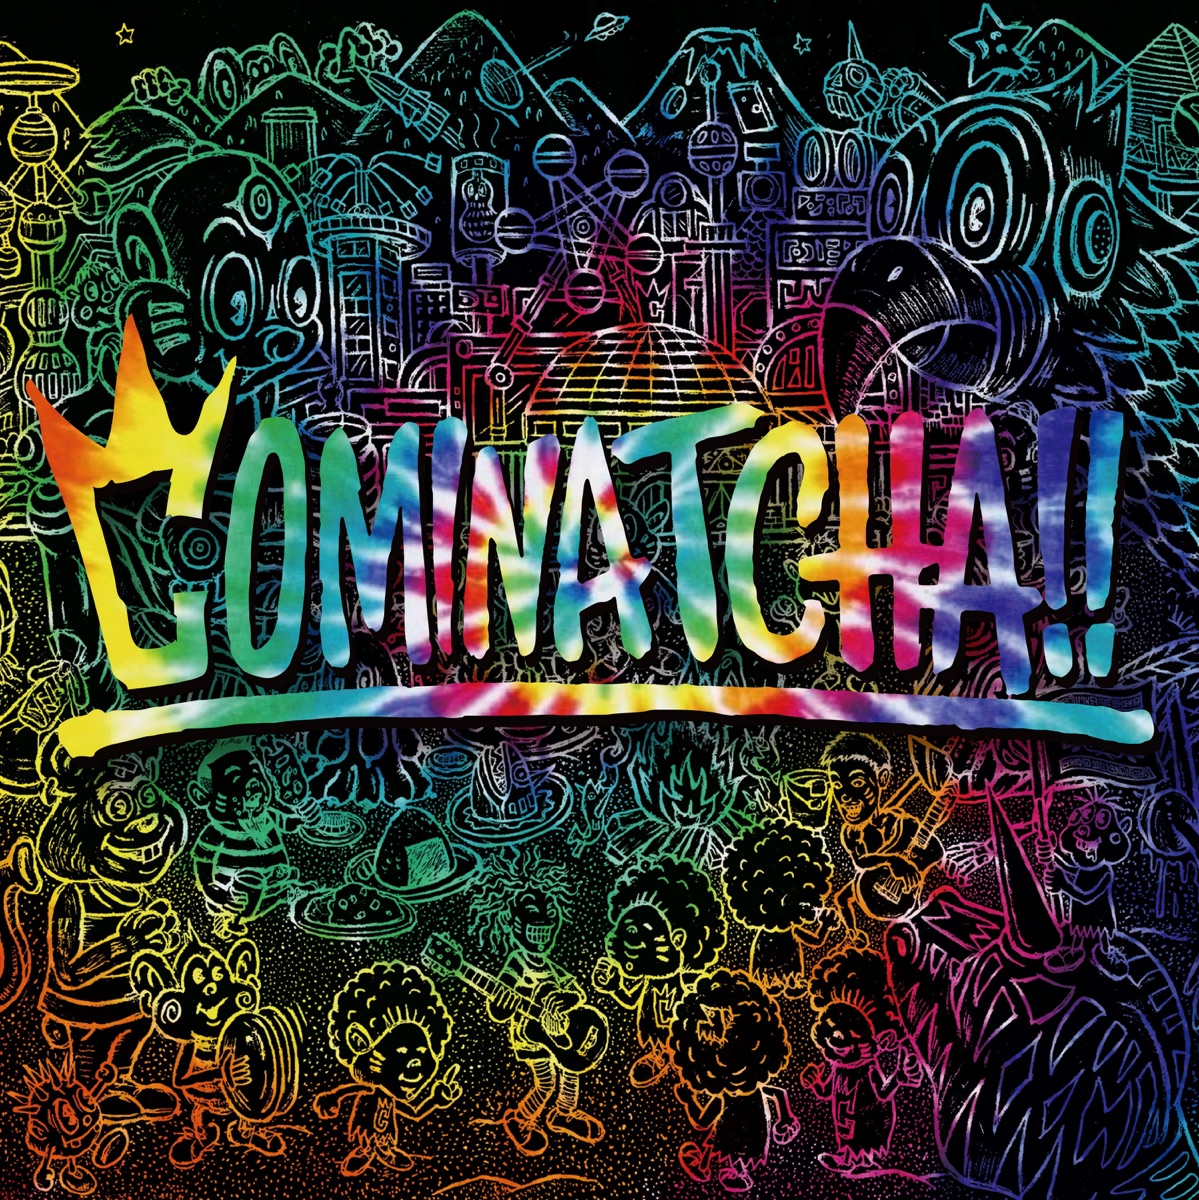 『WANIMA - ここに』収録の『COMINATCHA!!』ジャケット